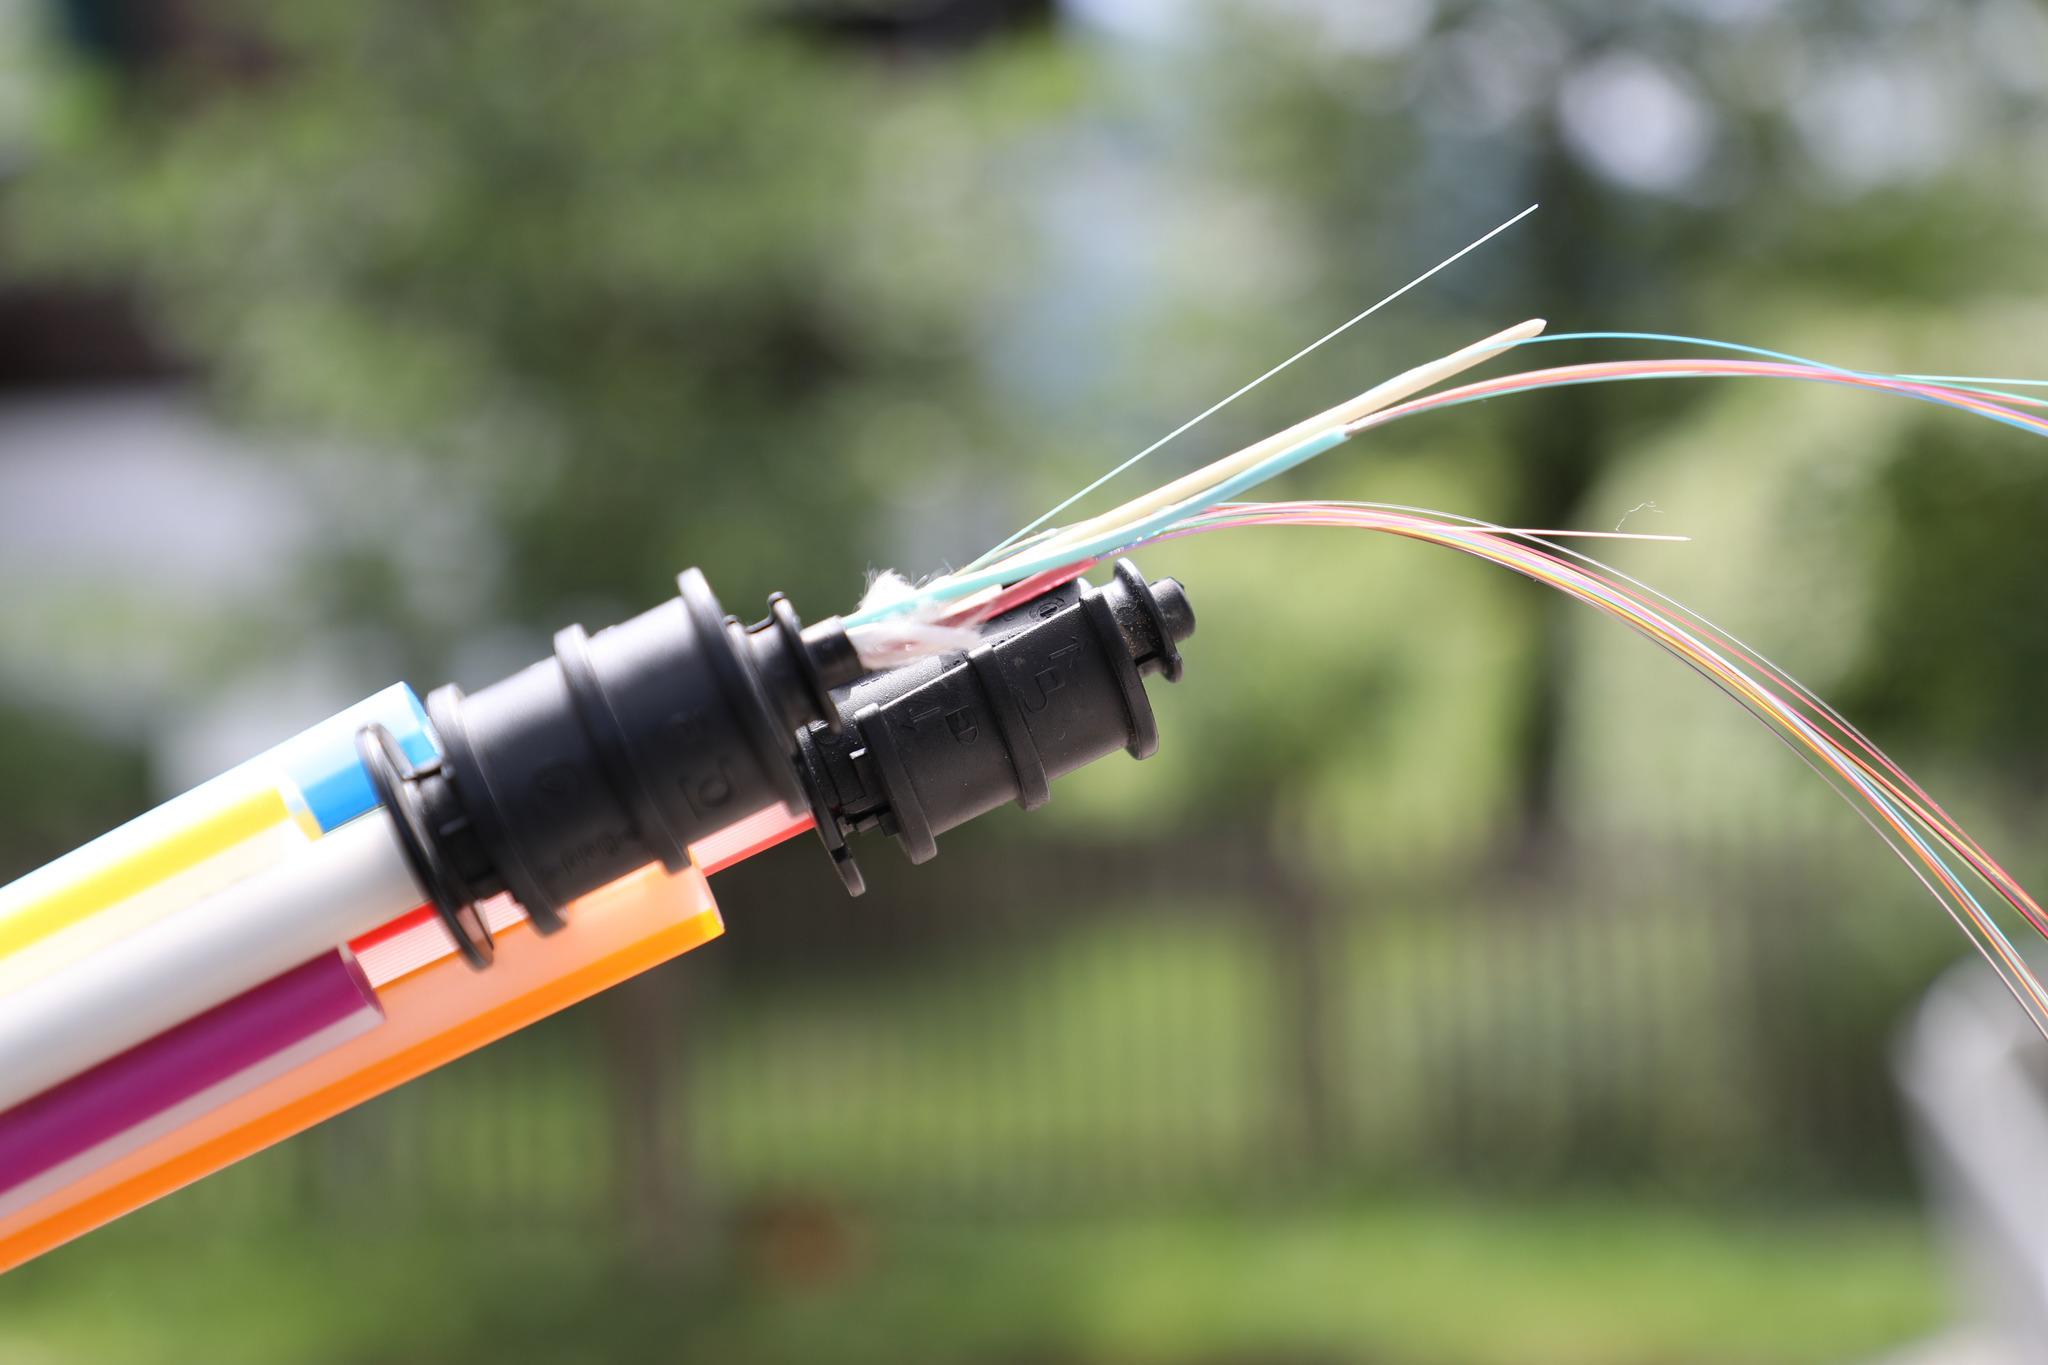 Breitband Internetverbindung